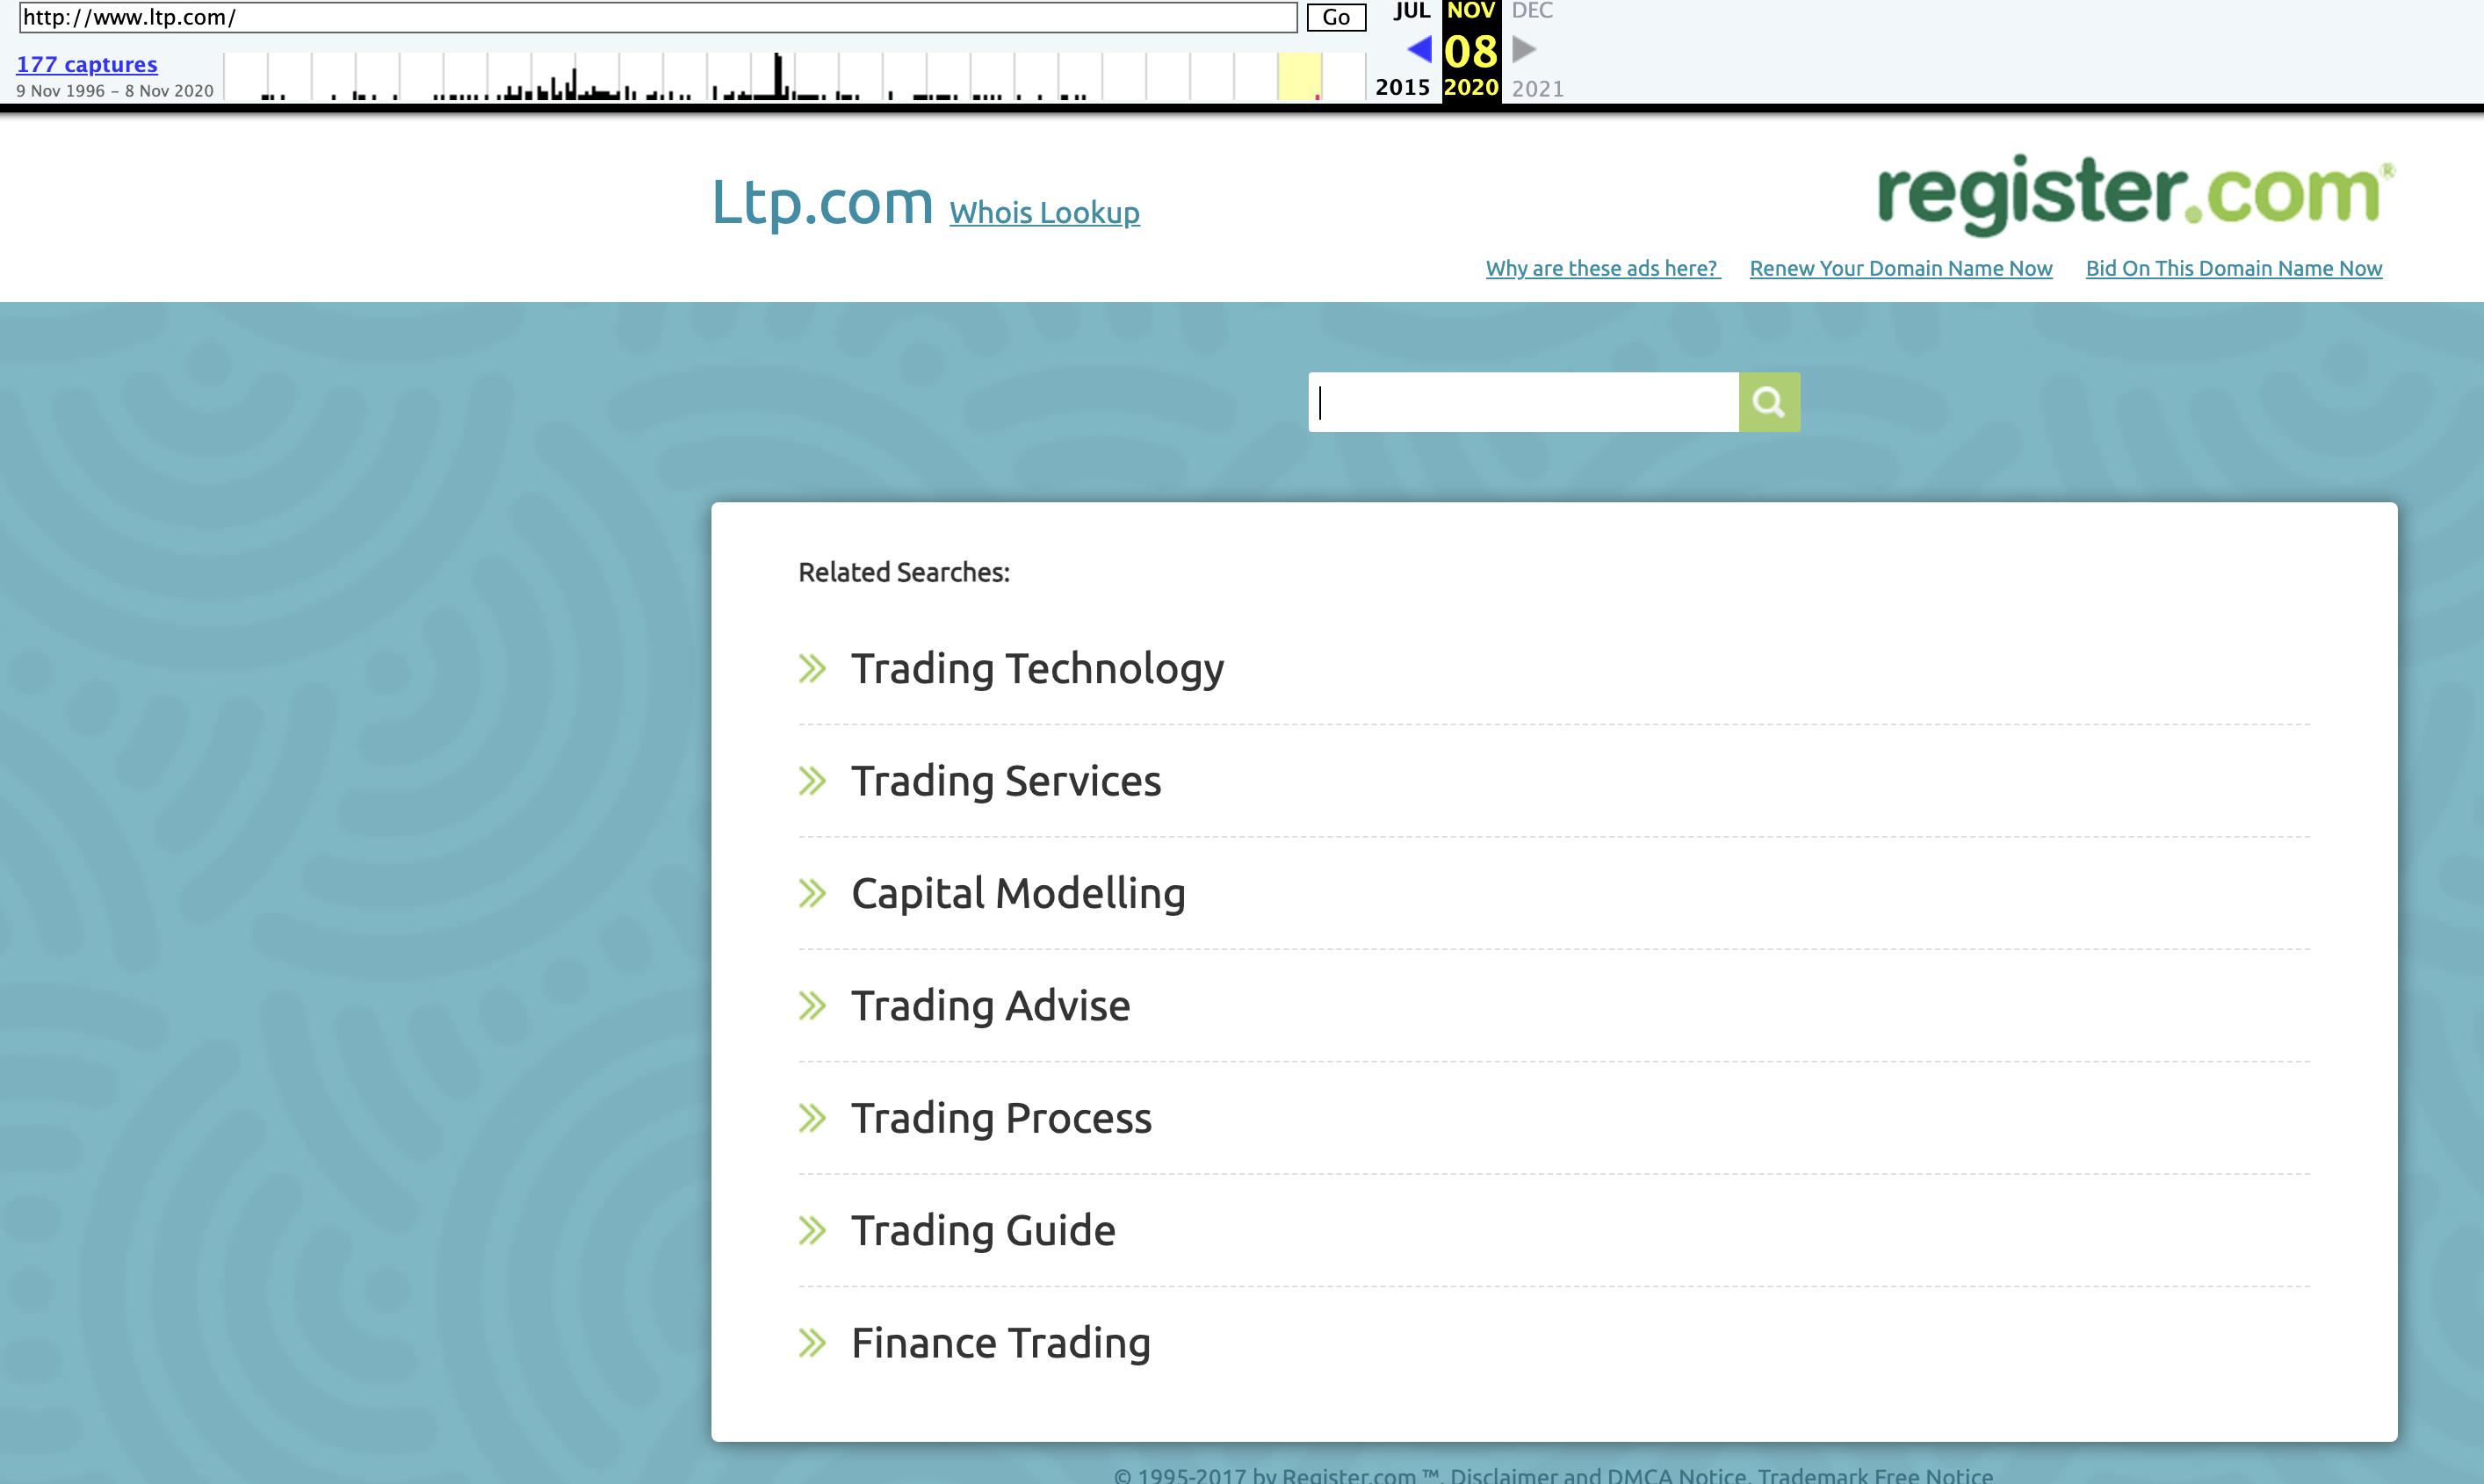 Register.com Parking Page - Trading